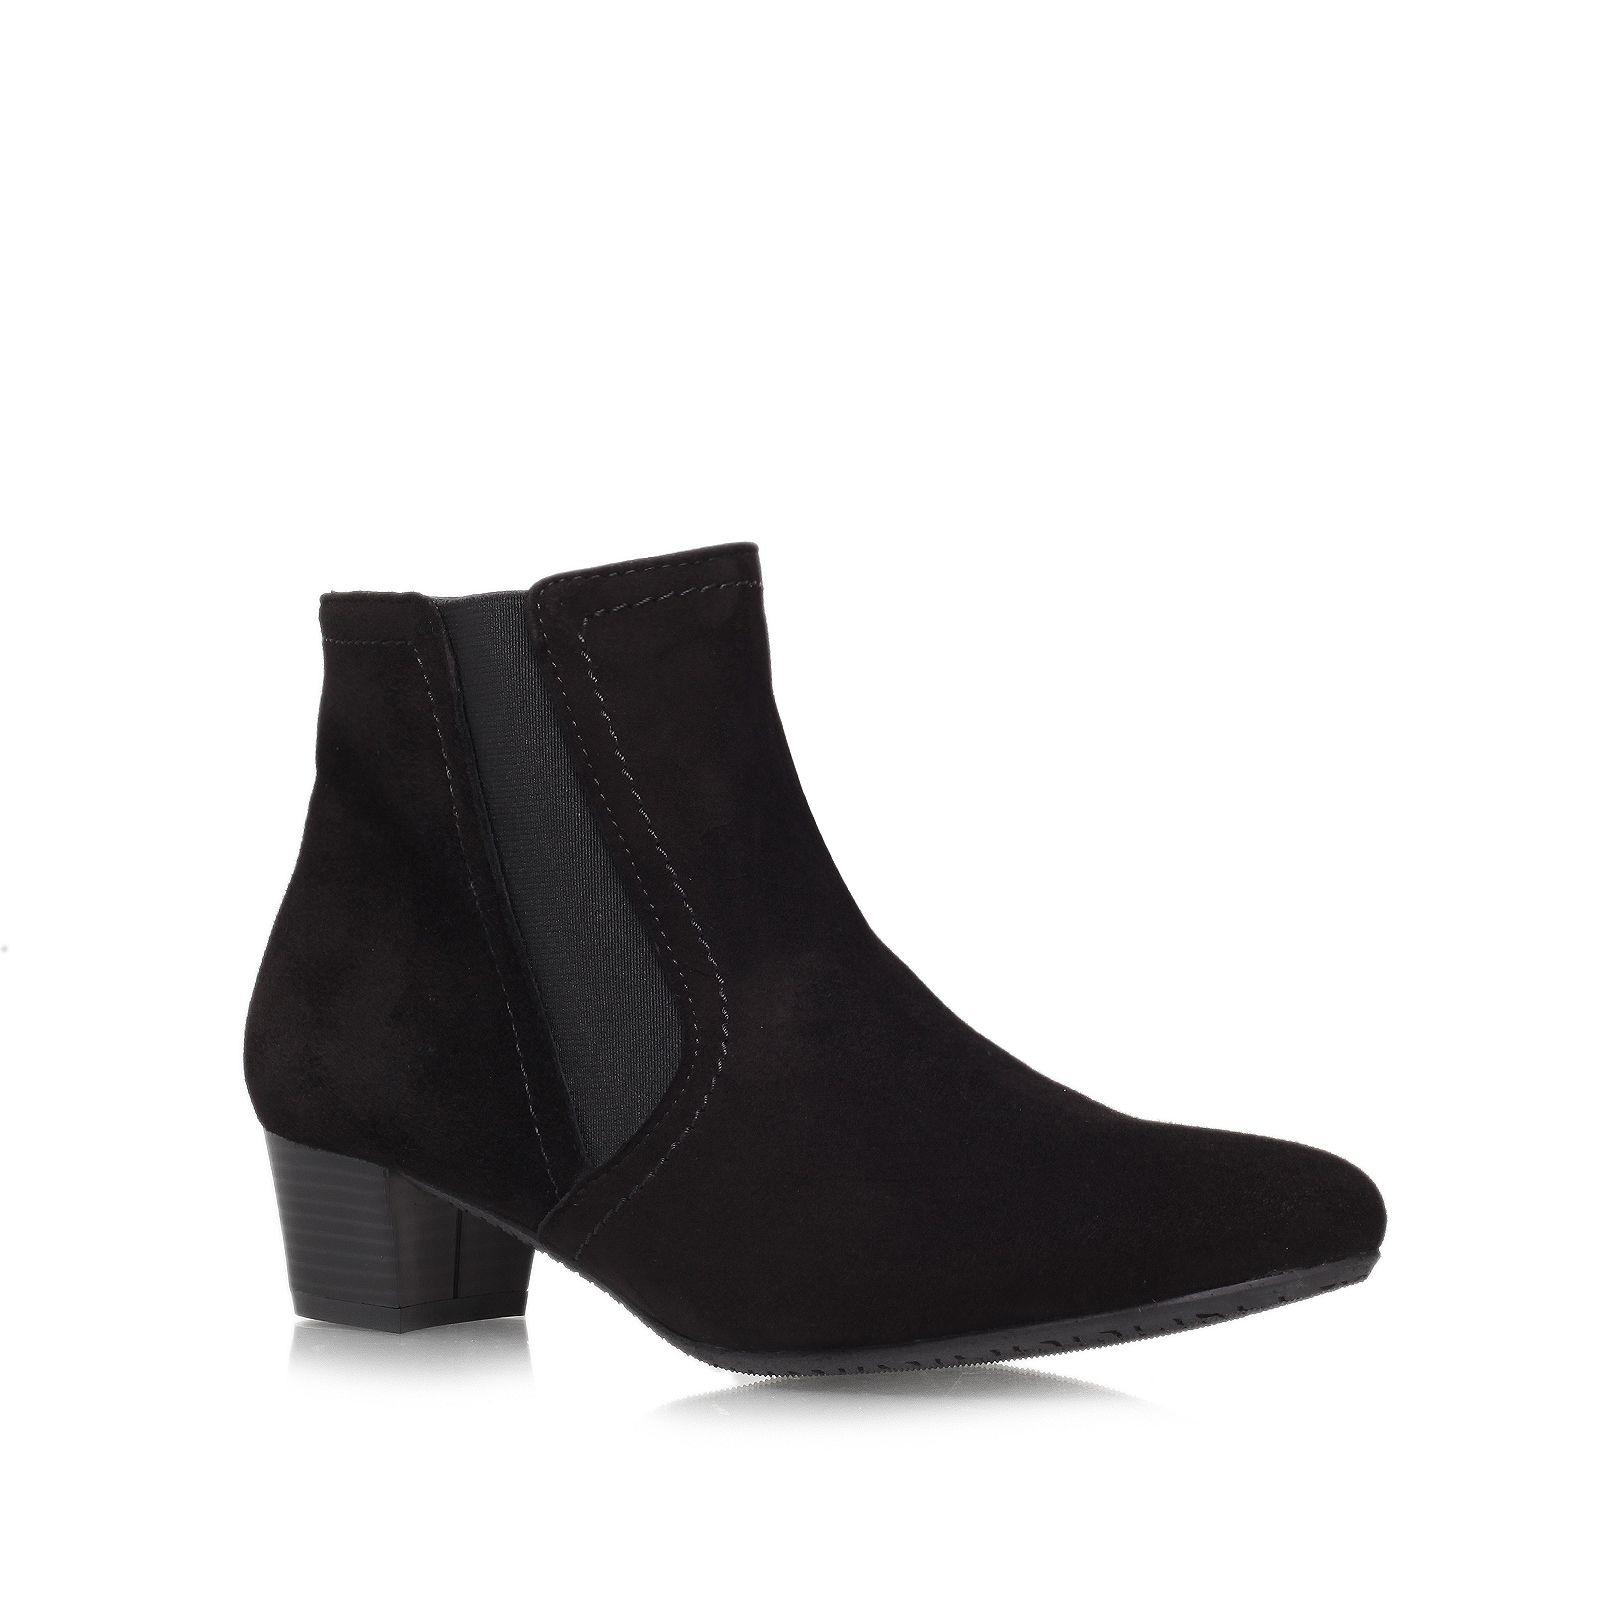 carvela kurt geiger remi low heeled ankle boots in black